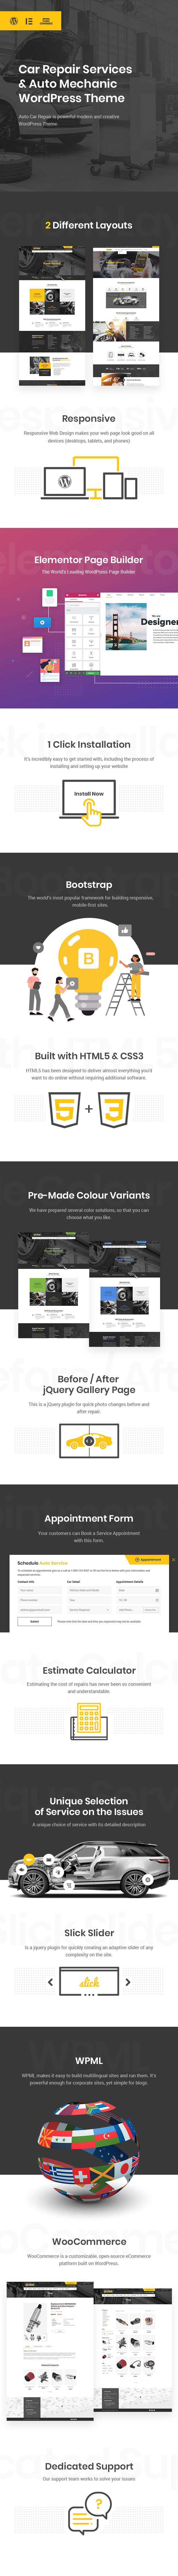 Car Repair Services & Auto Mechanic WordPress Theme + RTL - 4